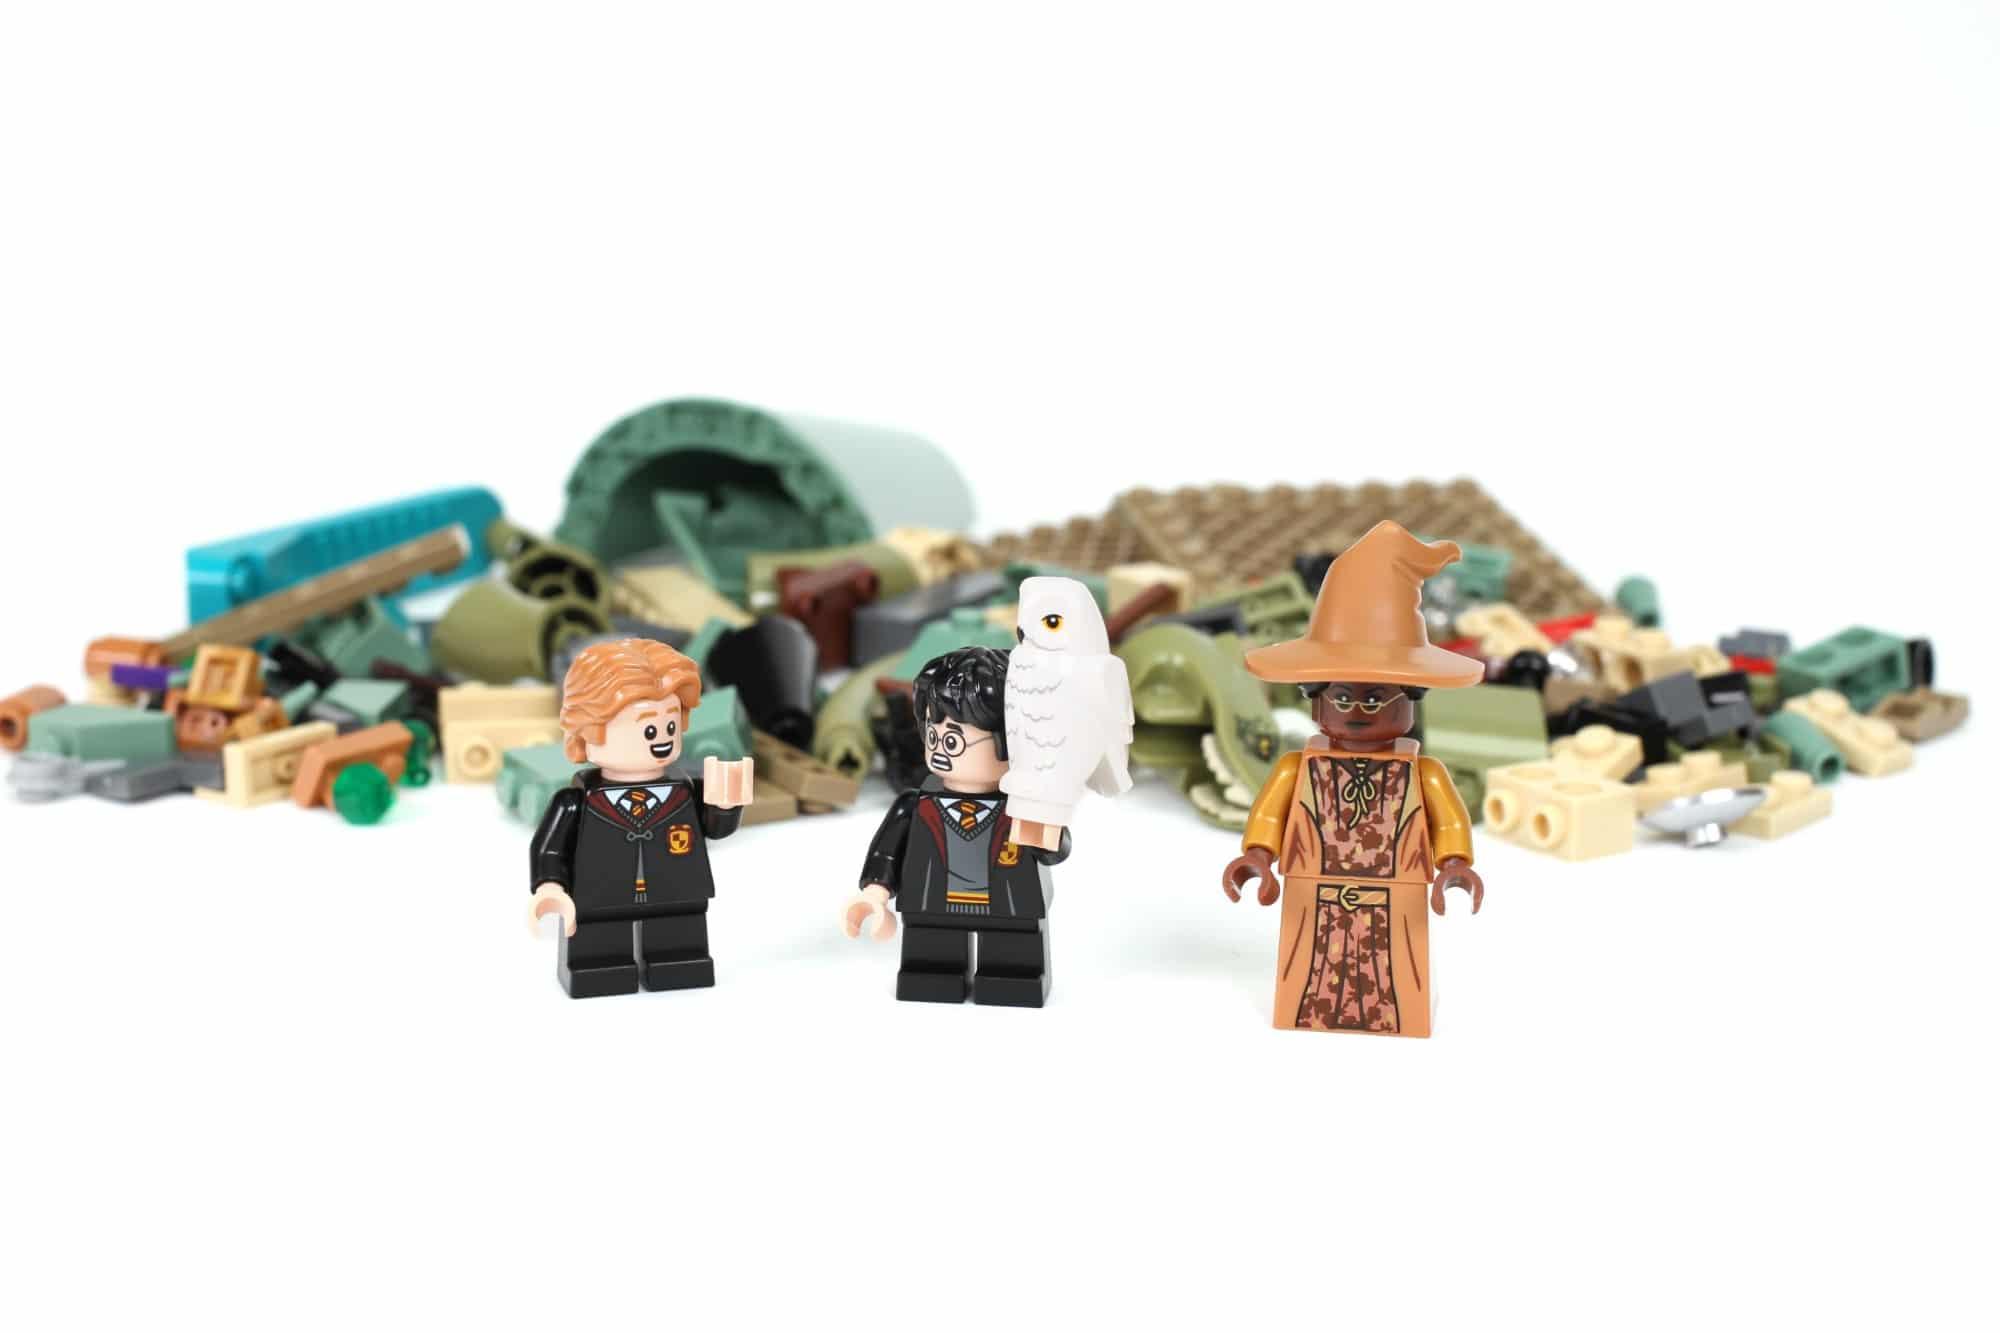 LEGO Harry Potter 76389 Hogwarts Kammer Des Schreckens Schritt 1 1